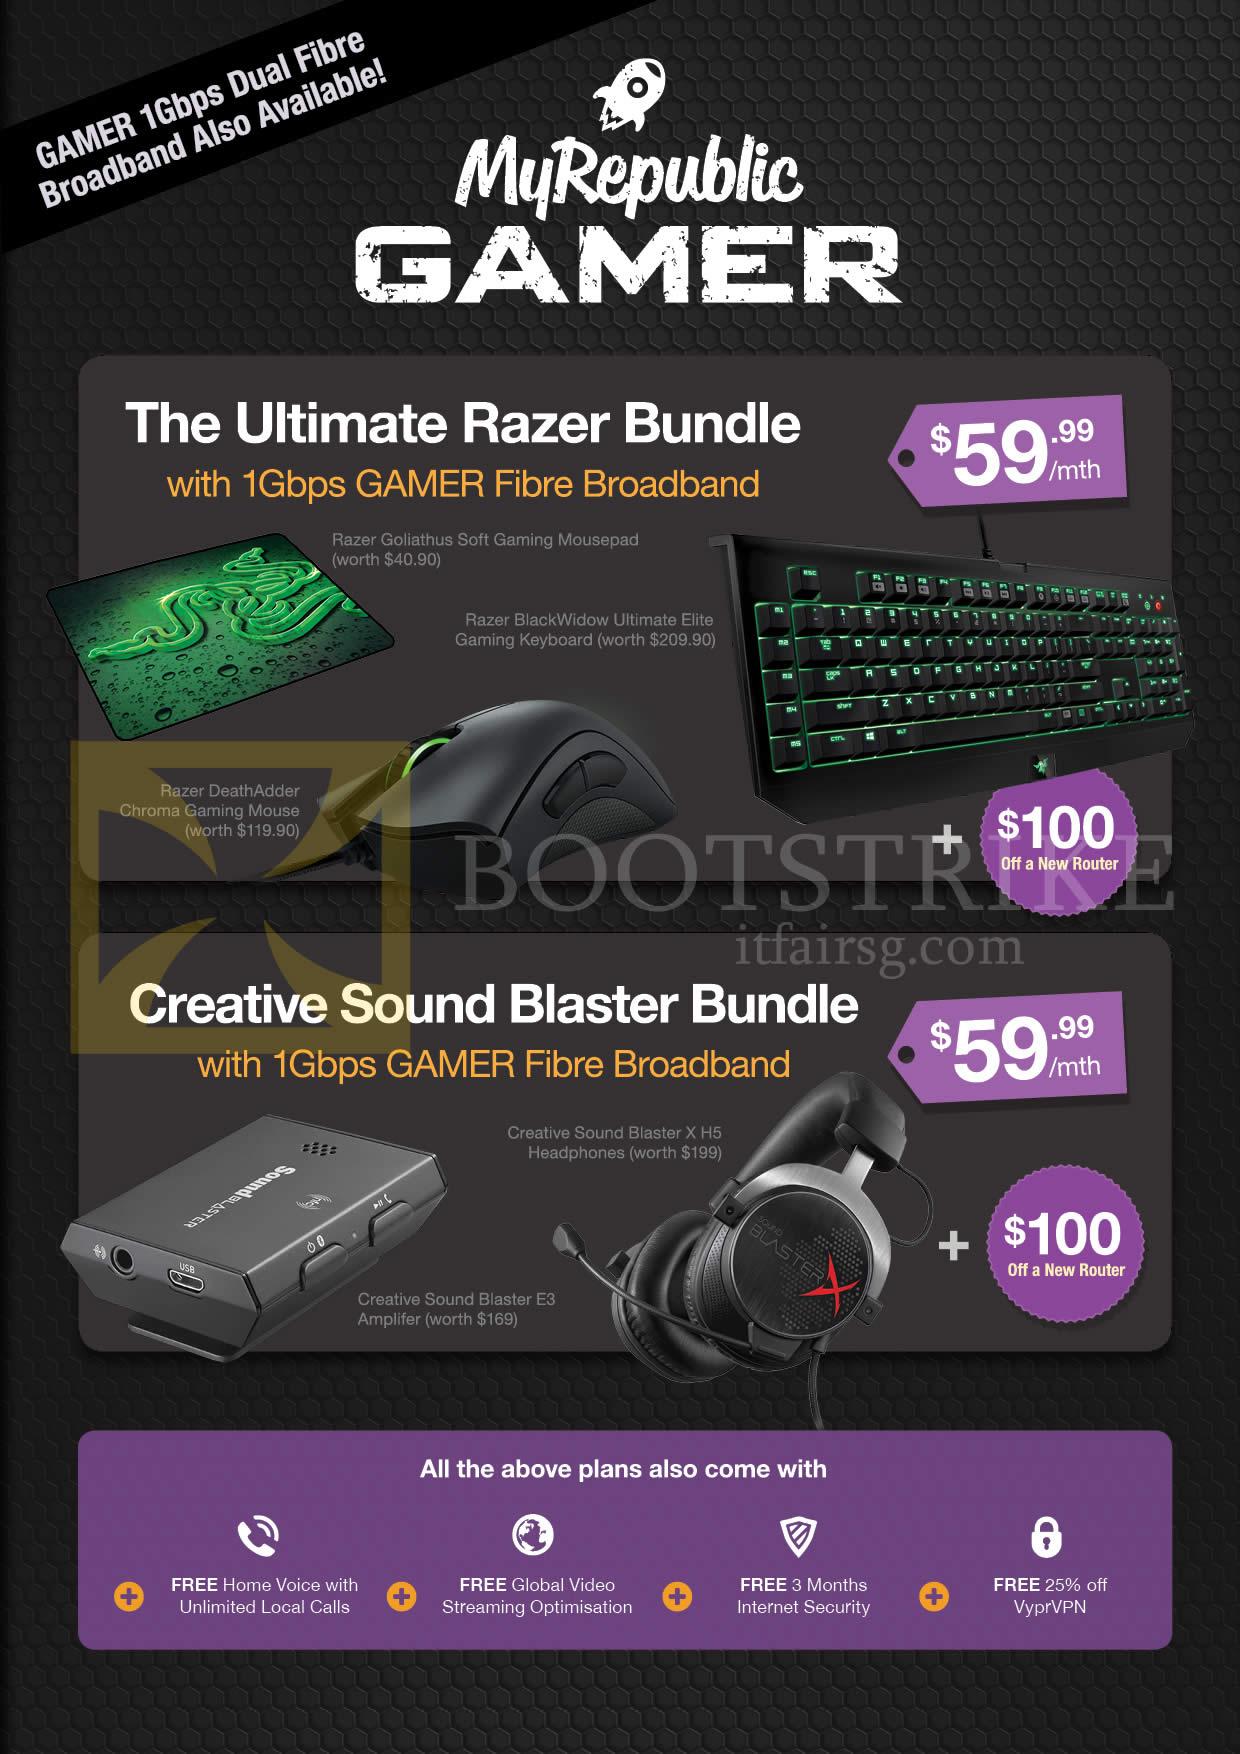 SITEX 2015 price list image brochure of MyRepublic Gamer Ultimate Razer Bundle, Creative Sound Blaster Bundle